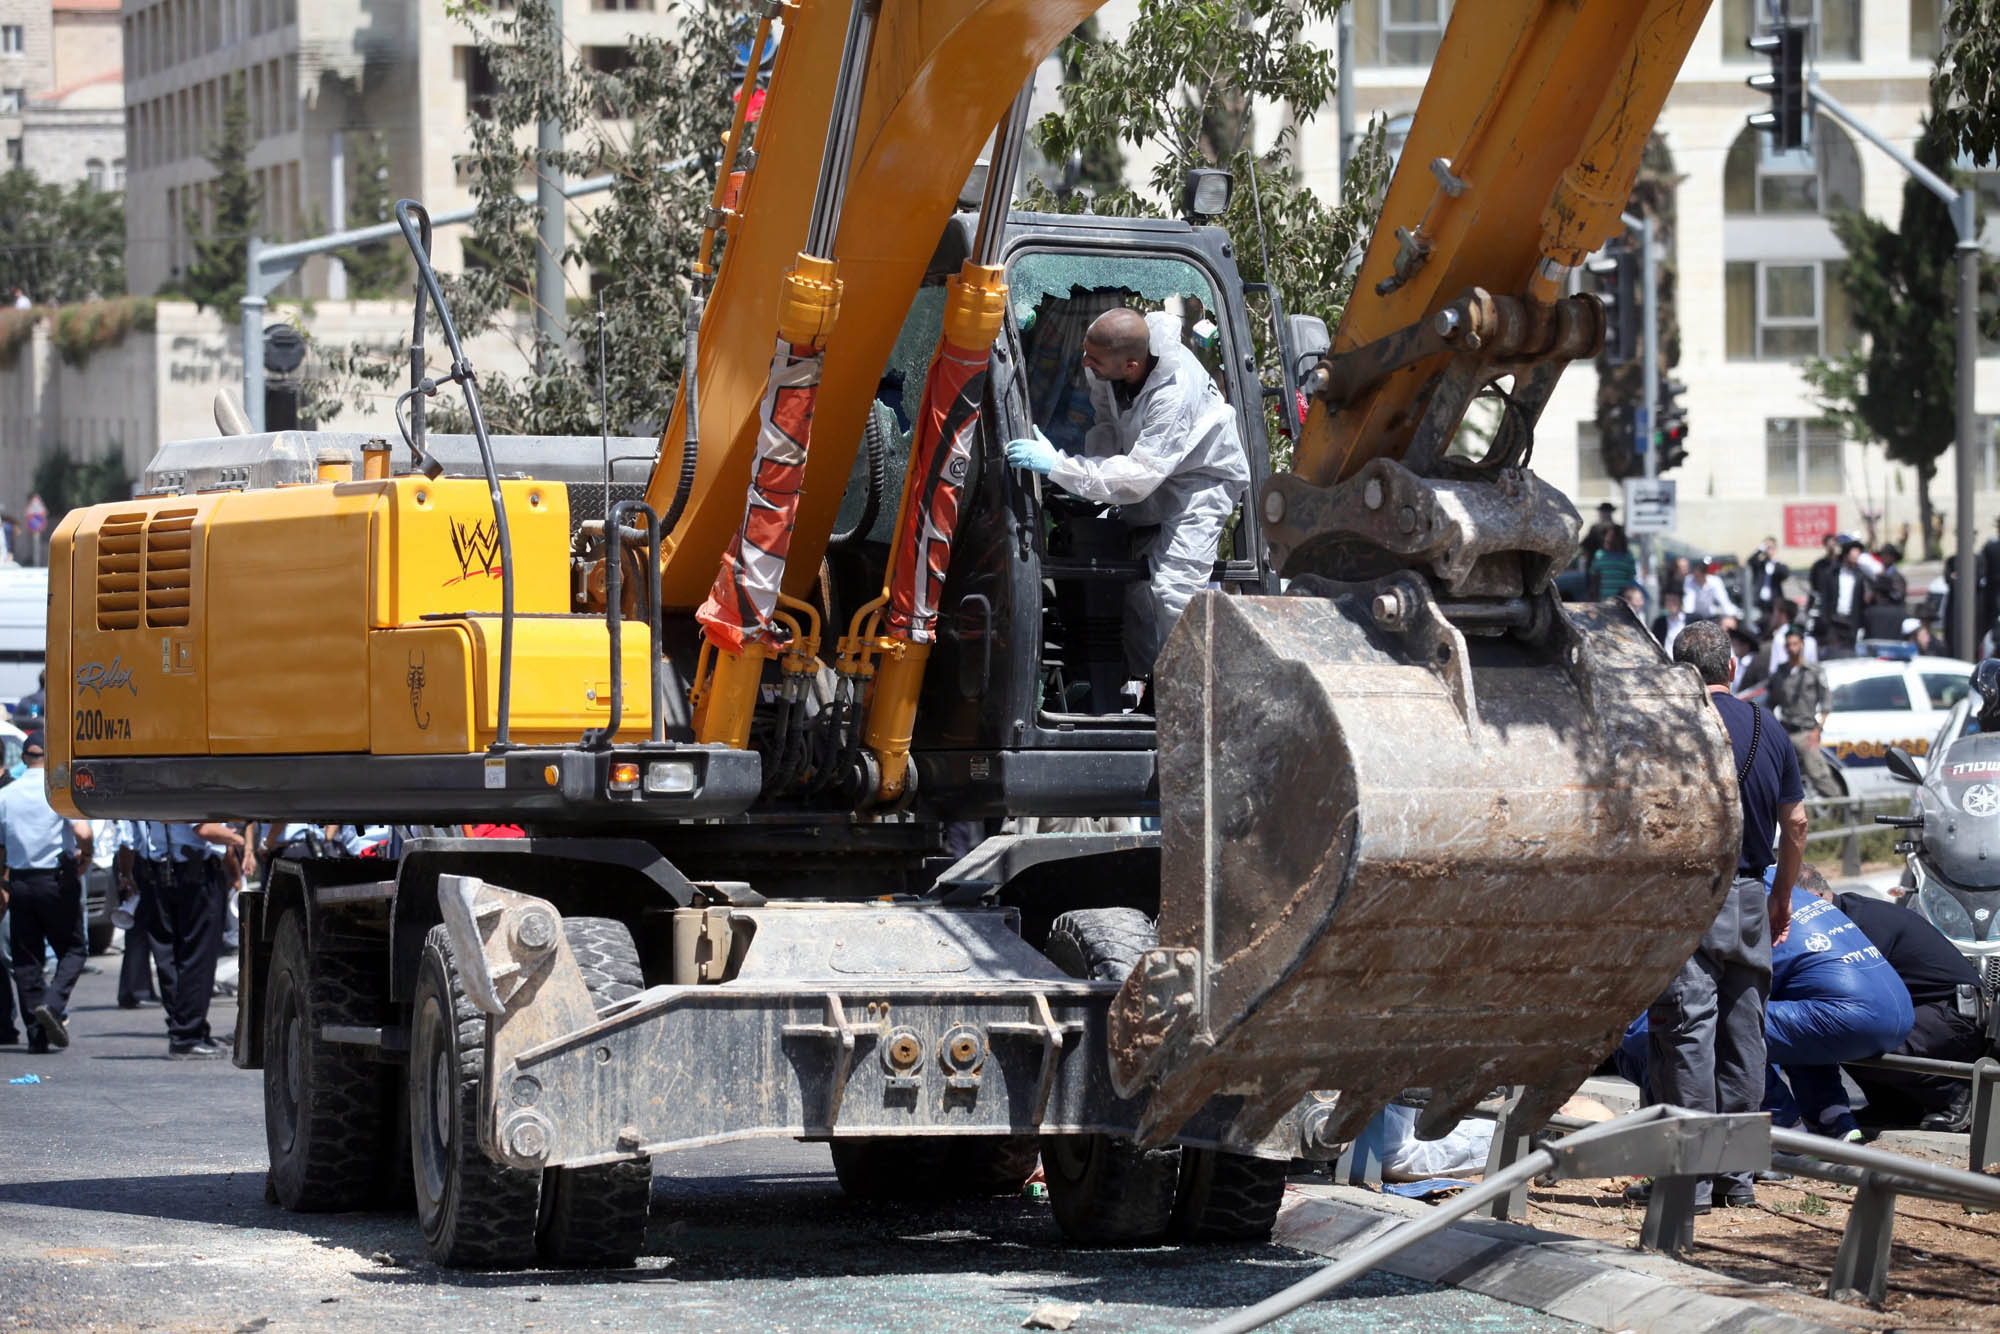 Israeli forensic police inspect the bulldozer at the scene of attack in Jerusalem,  Aug. 4, 2014.